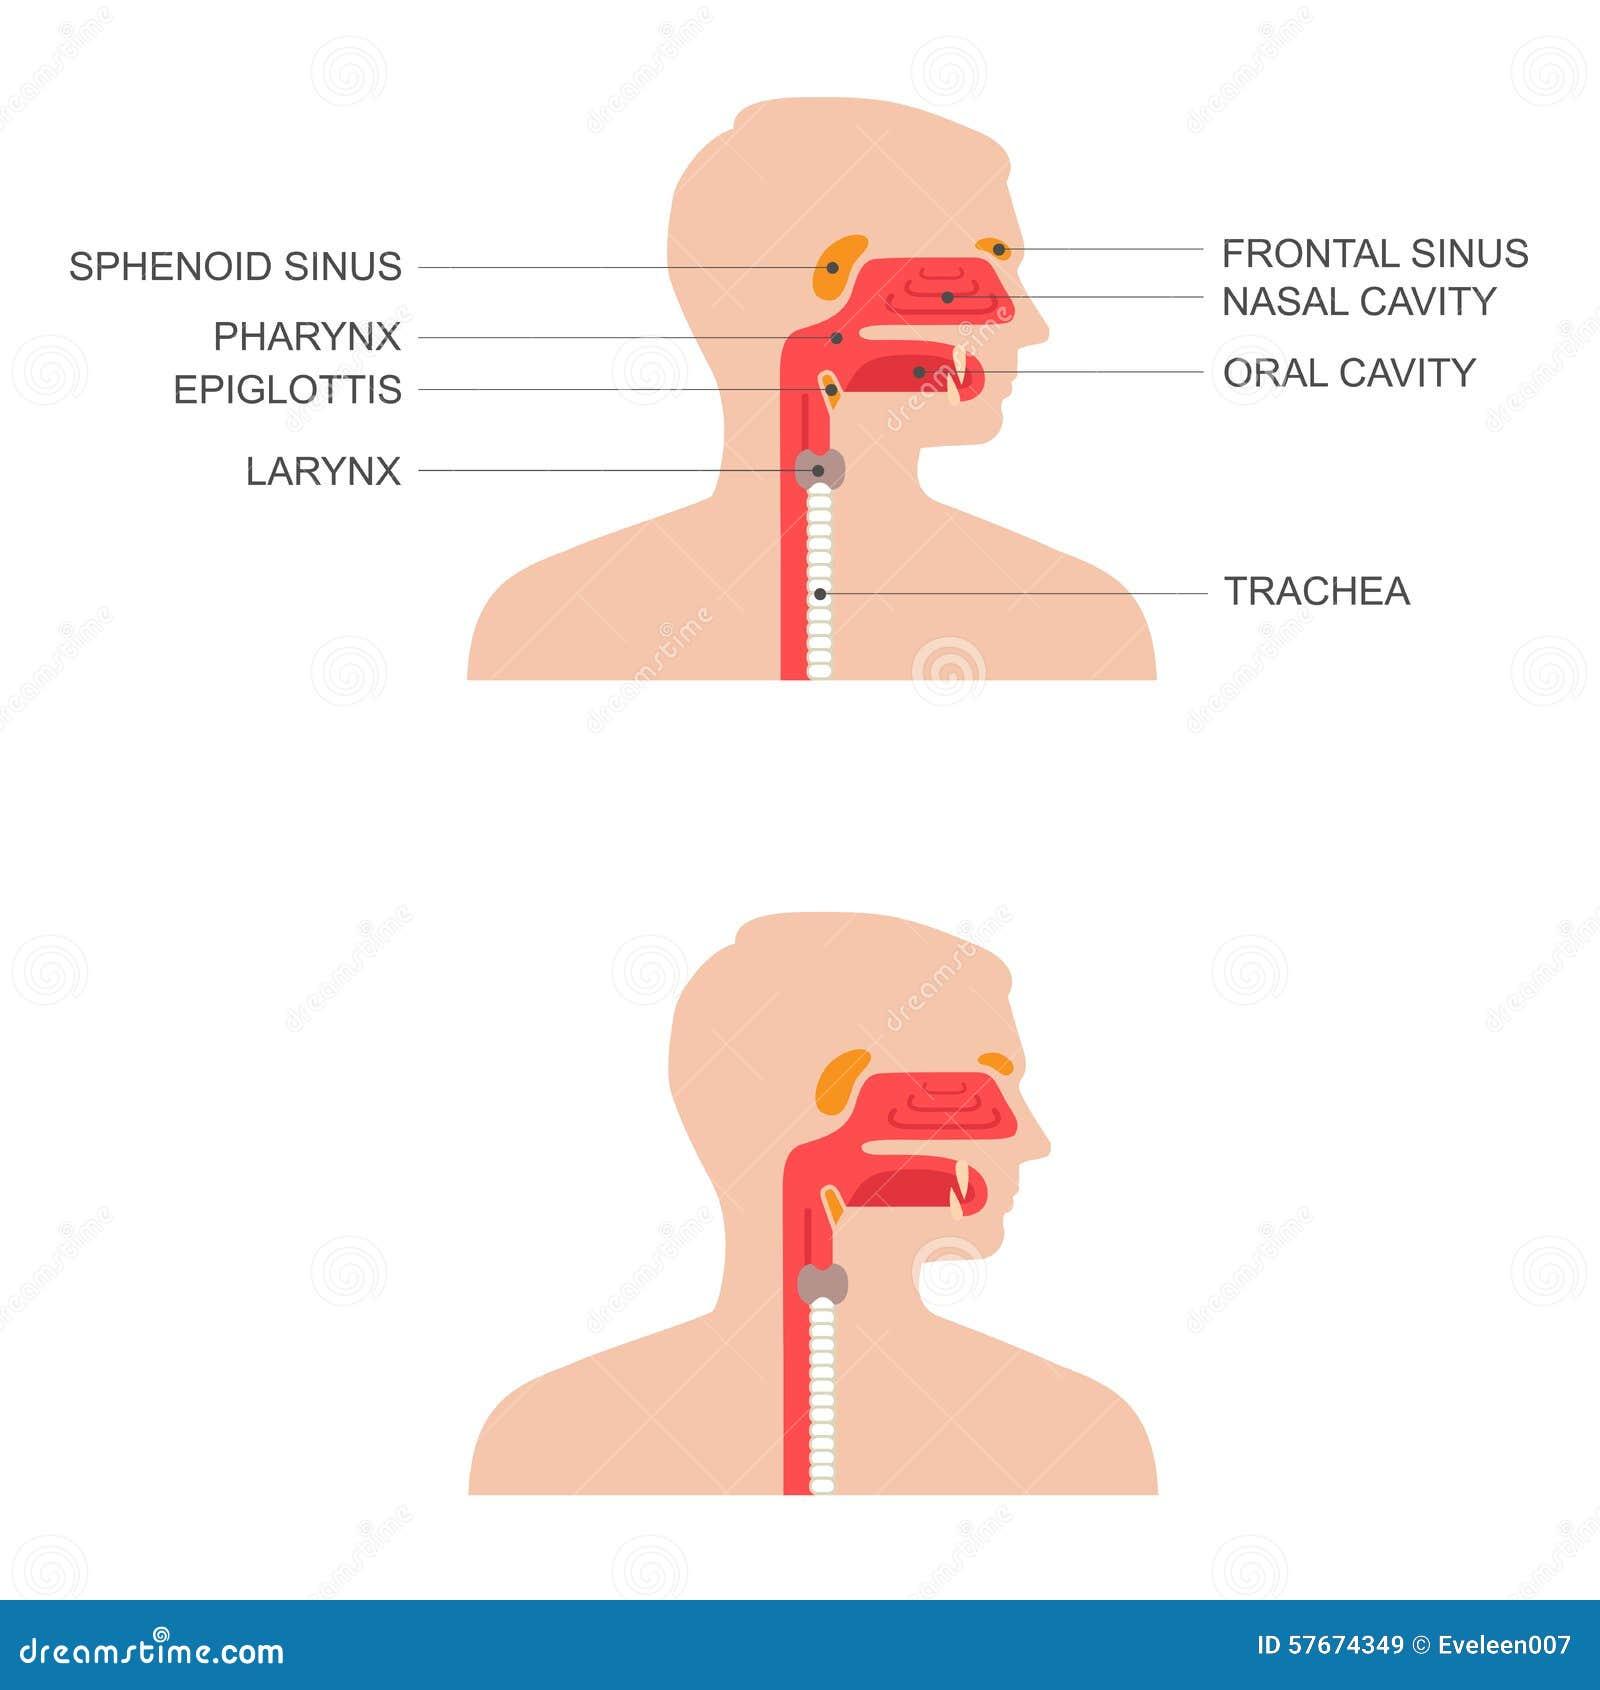 Nose, throat anatomy, stock vector. Illustration of pharynx - 57674349